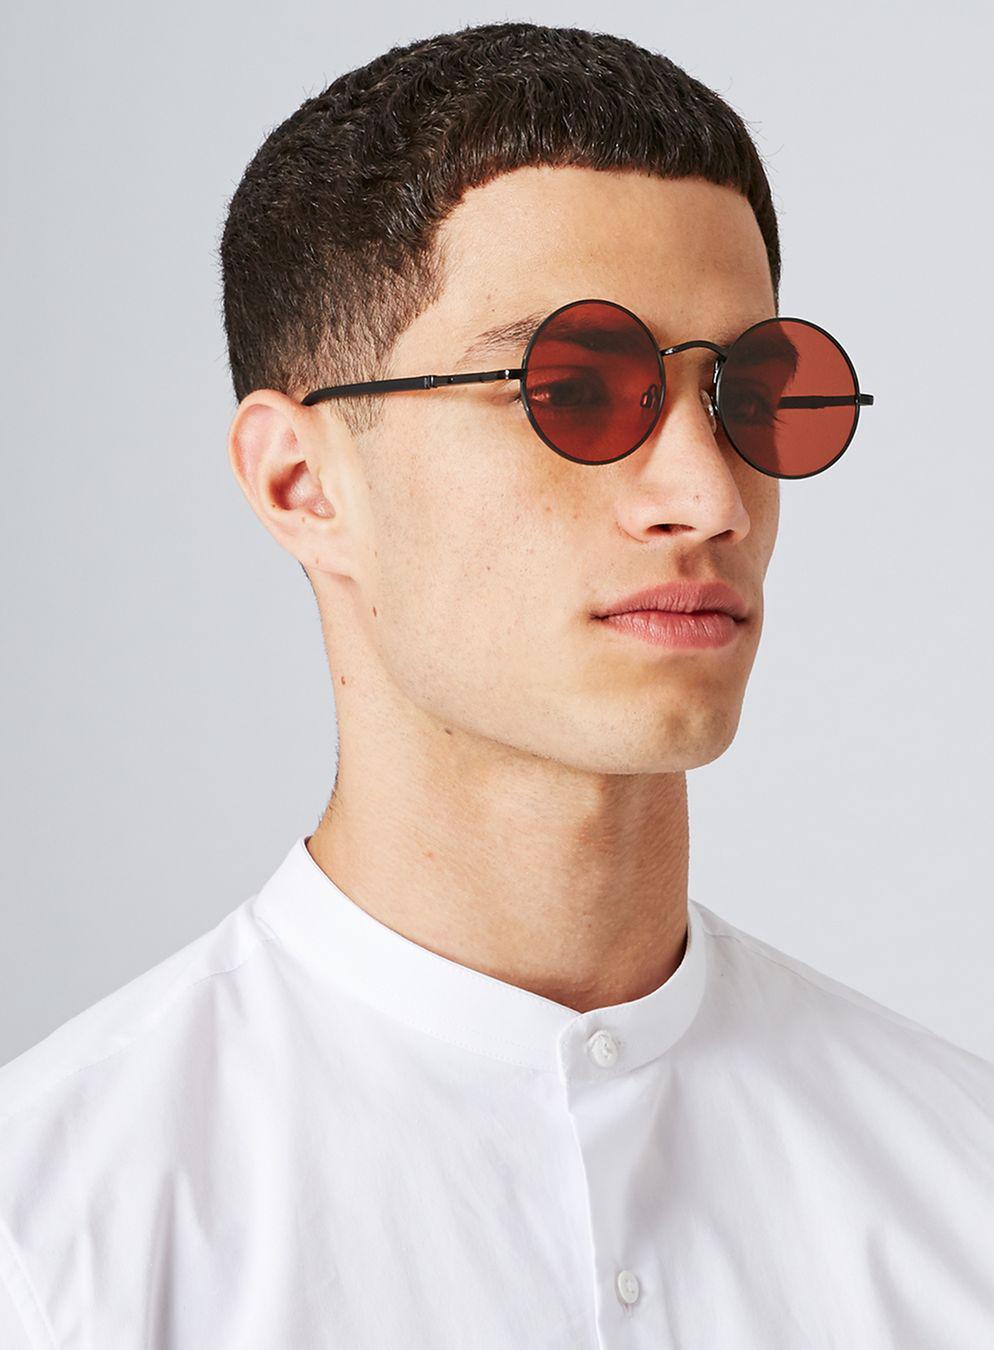 ba328339ddb36 TOPMAN Red Lens Round Sunglasses in Black for Men - Lyst